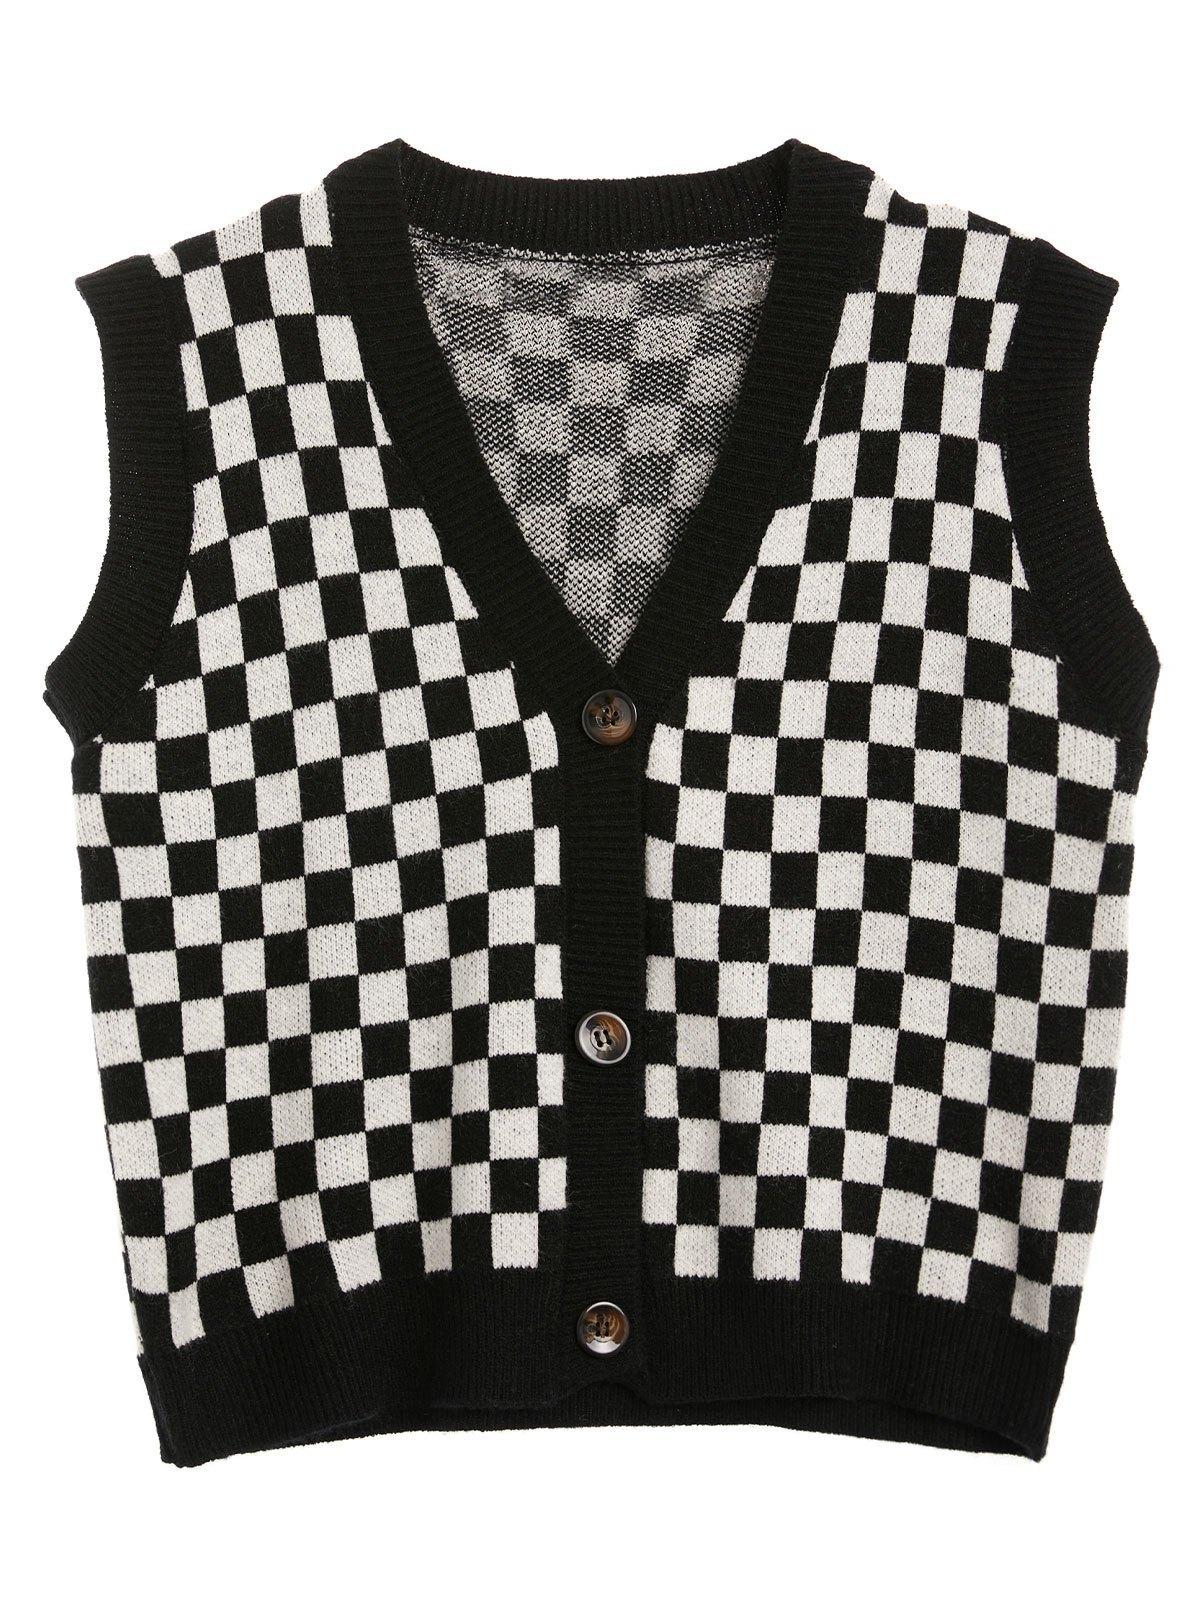 Checkerboard Print Sweater Vest - Mixcolor S